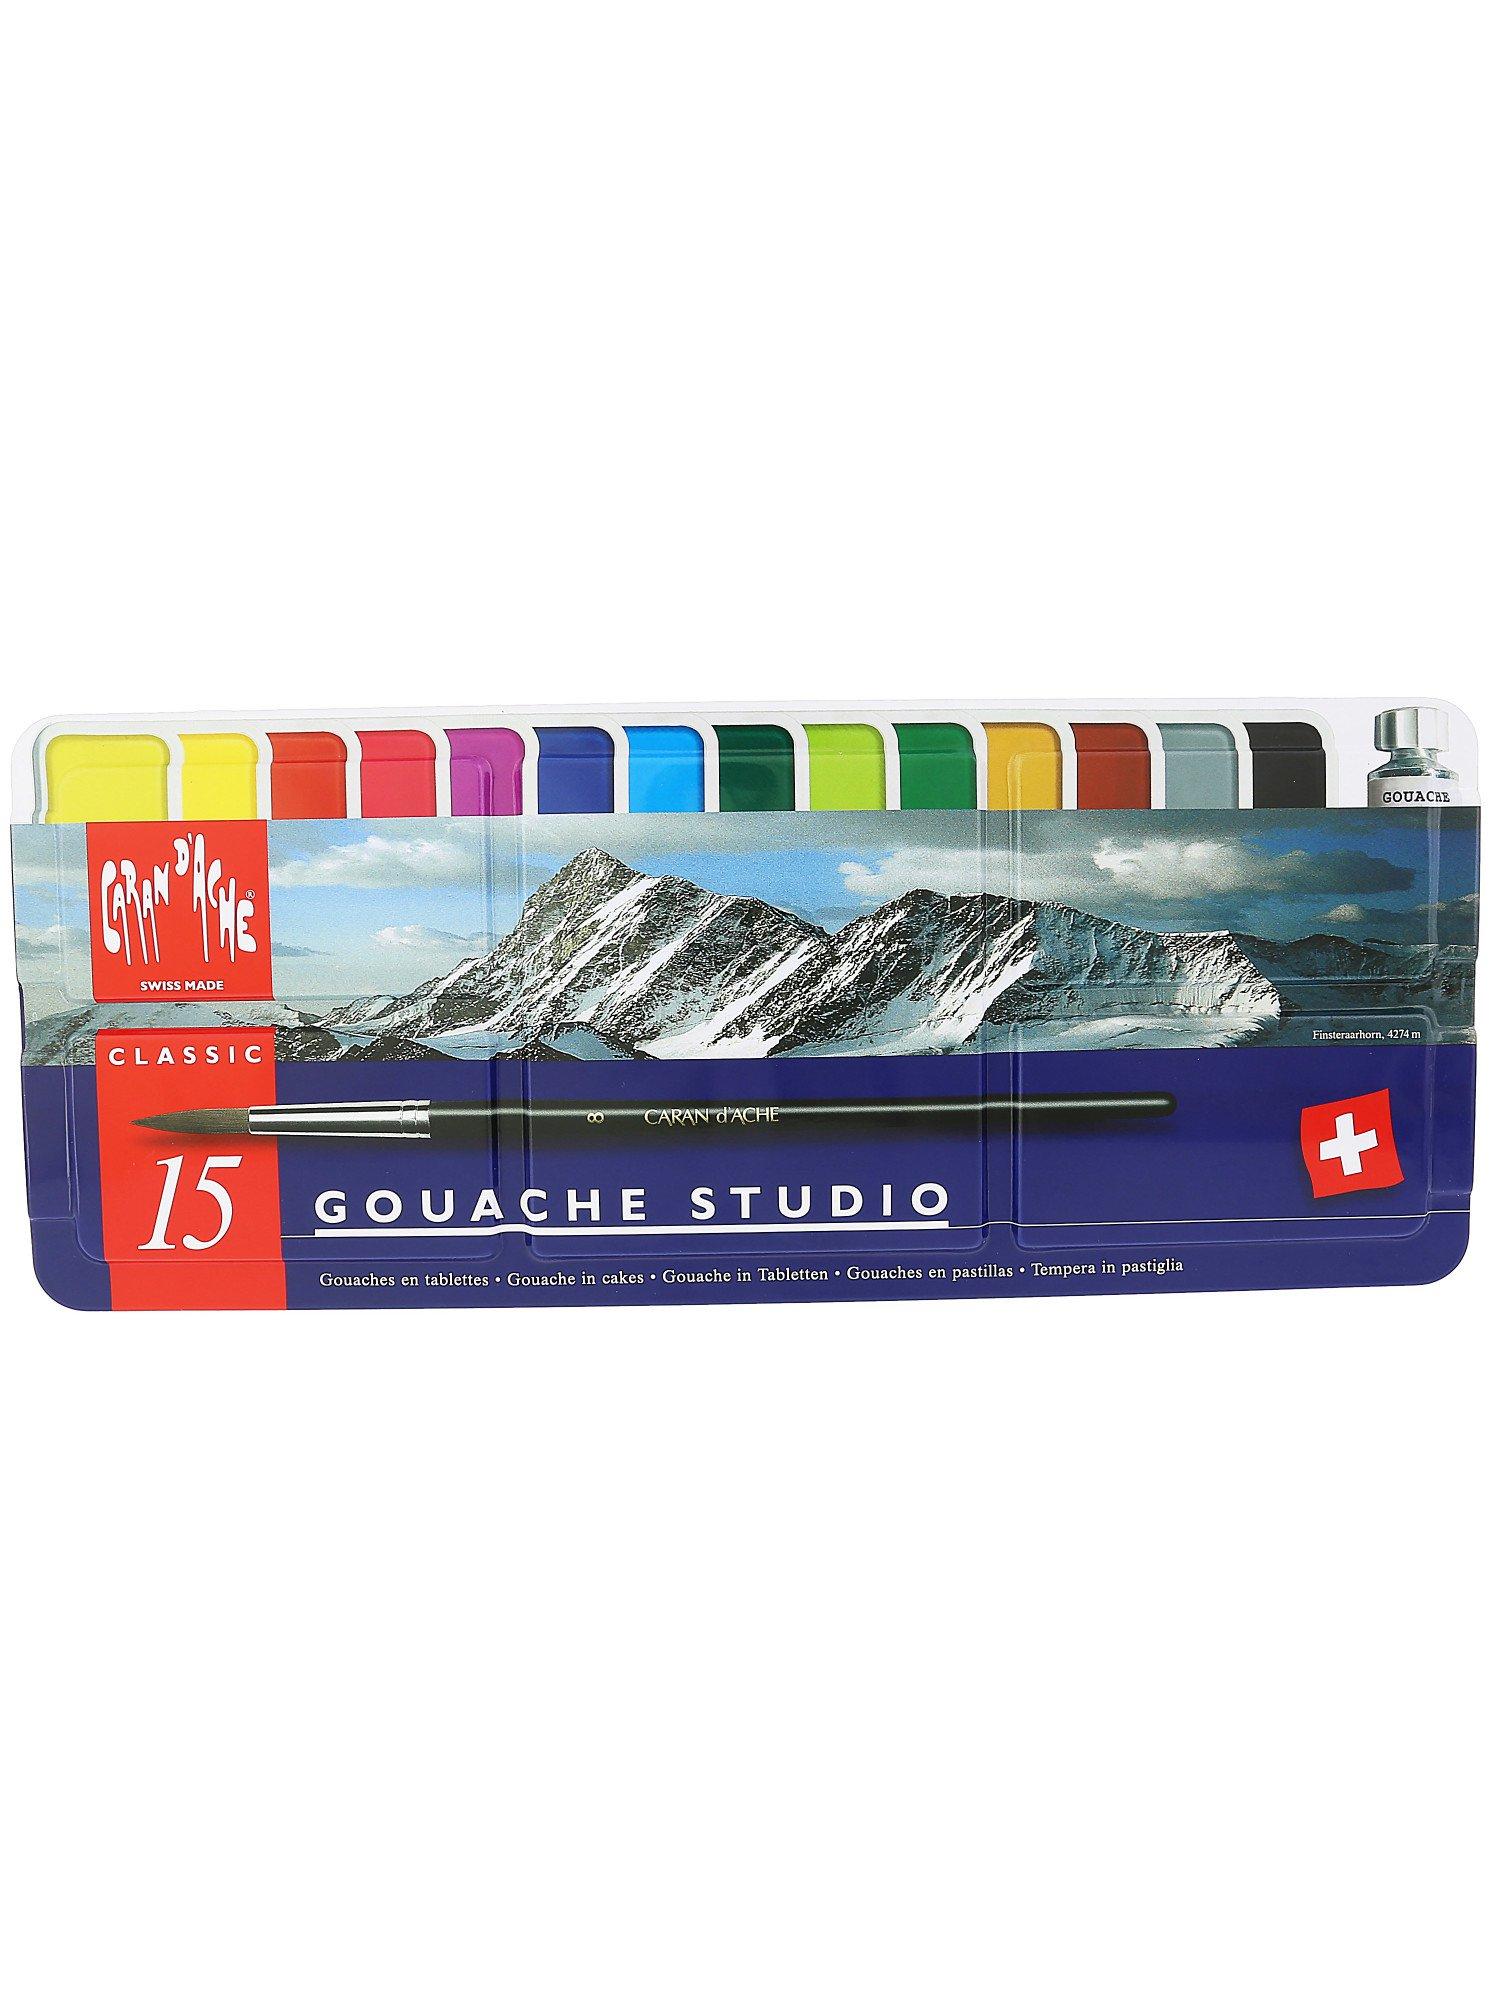 Gouache Pans : gouache, Caran, D'Ache, Gouache, Studio, Craft, Paint, 7610186143151, Walmart, Canada